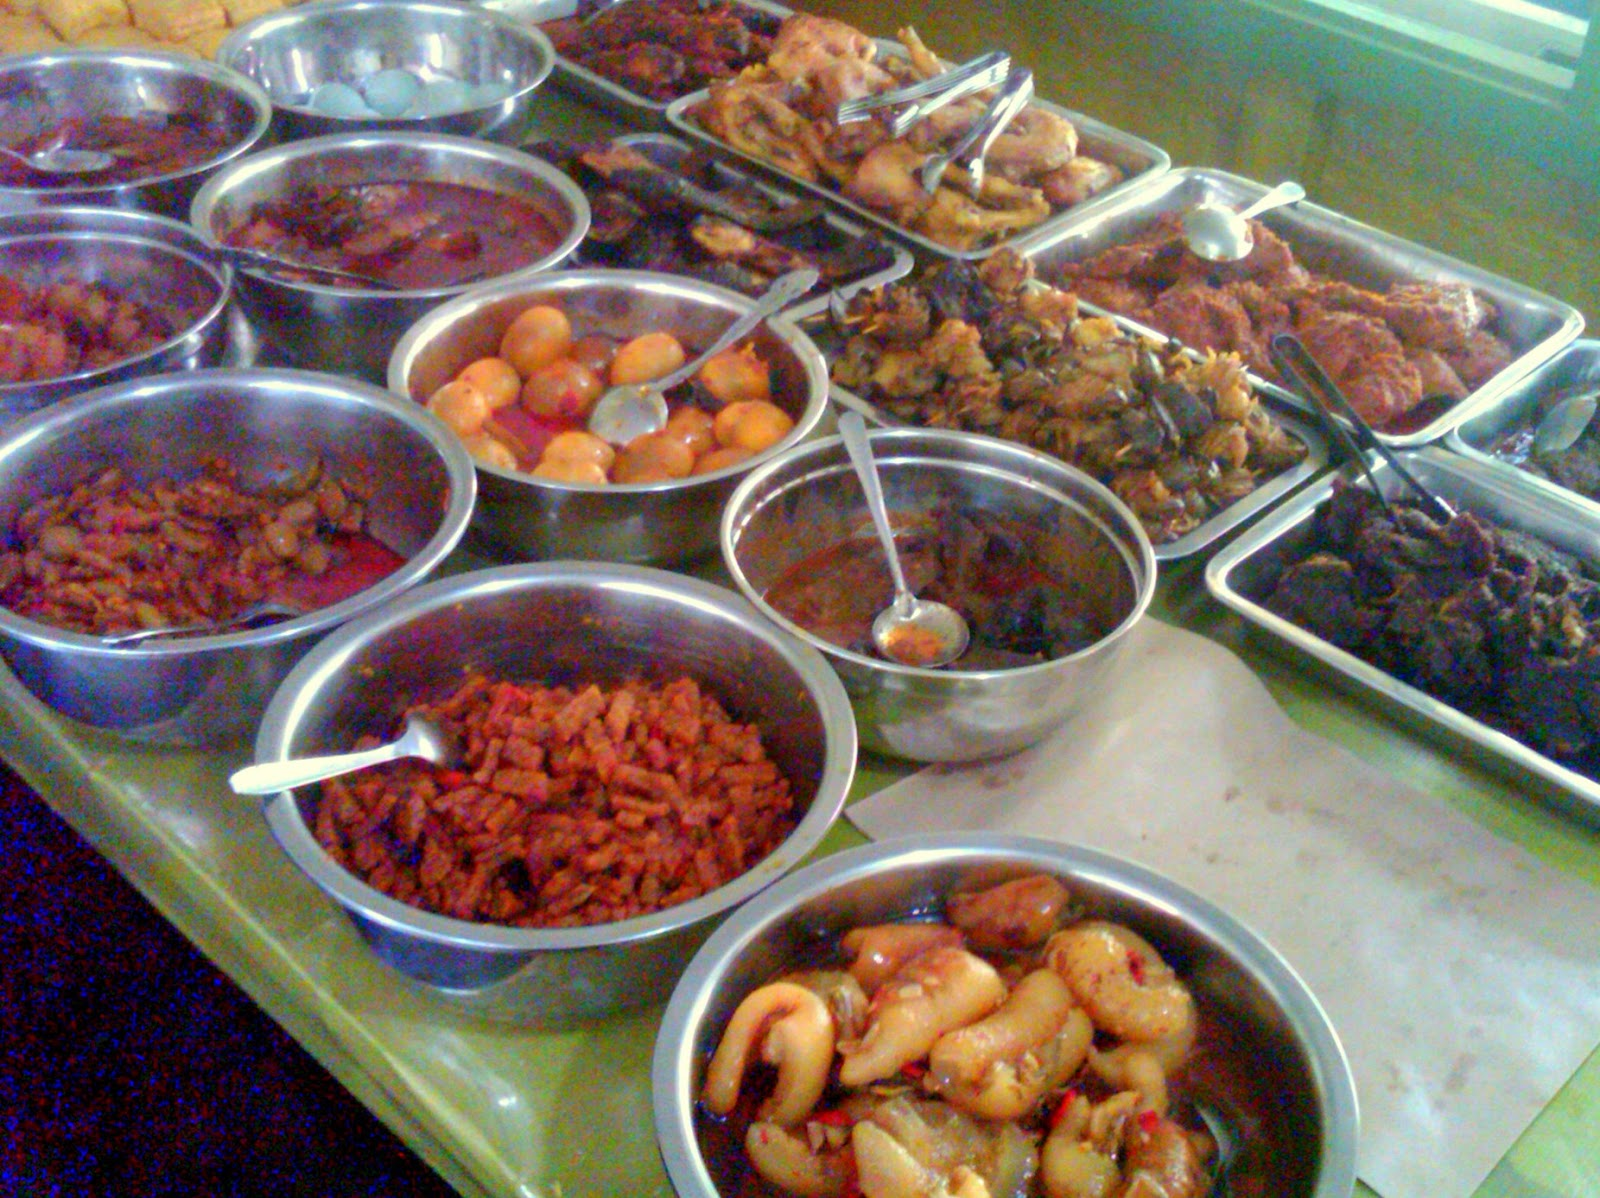 Memilih Makanan Berlemak